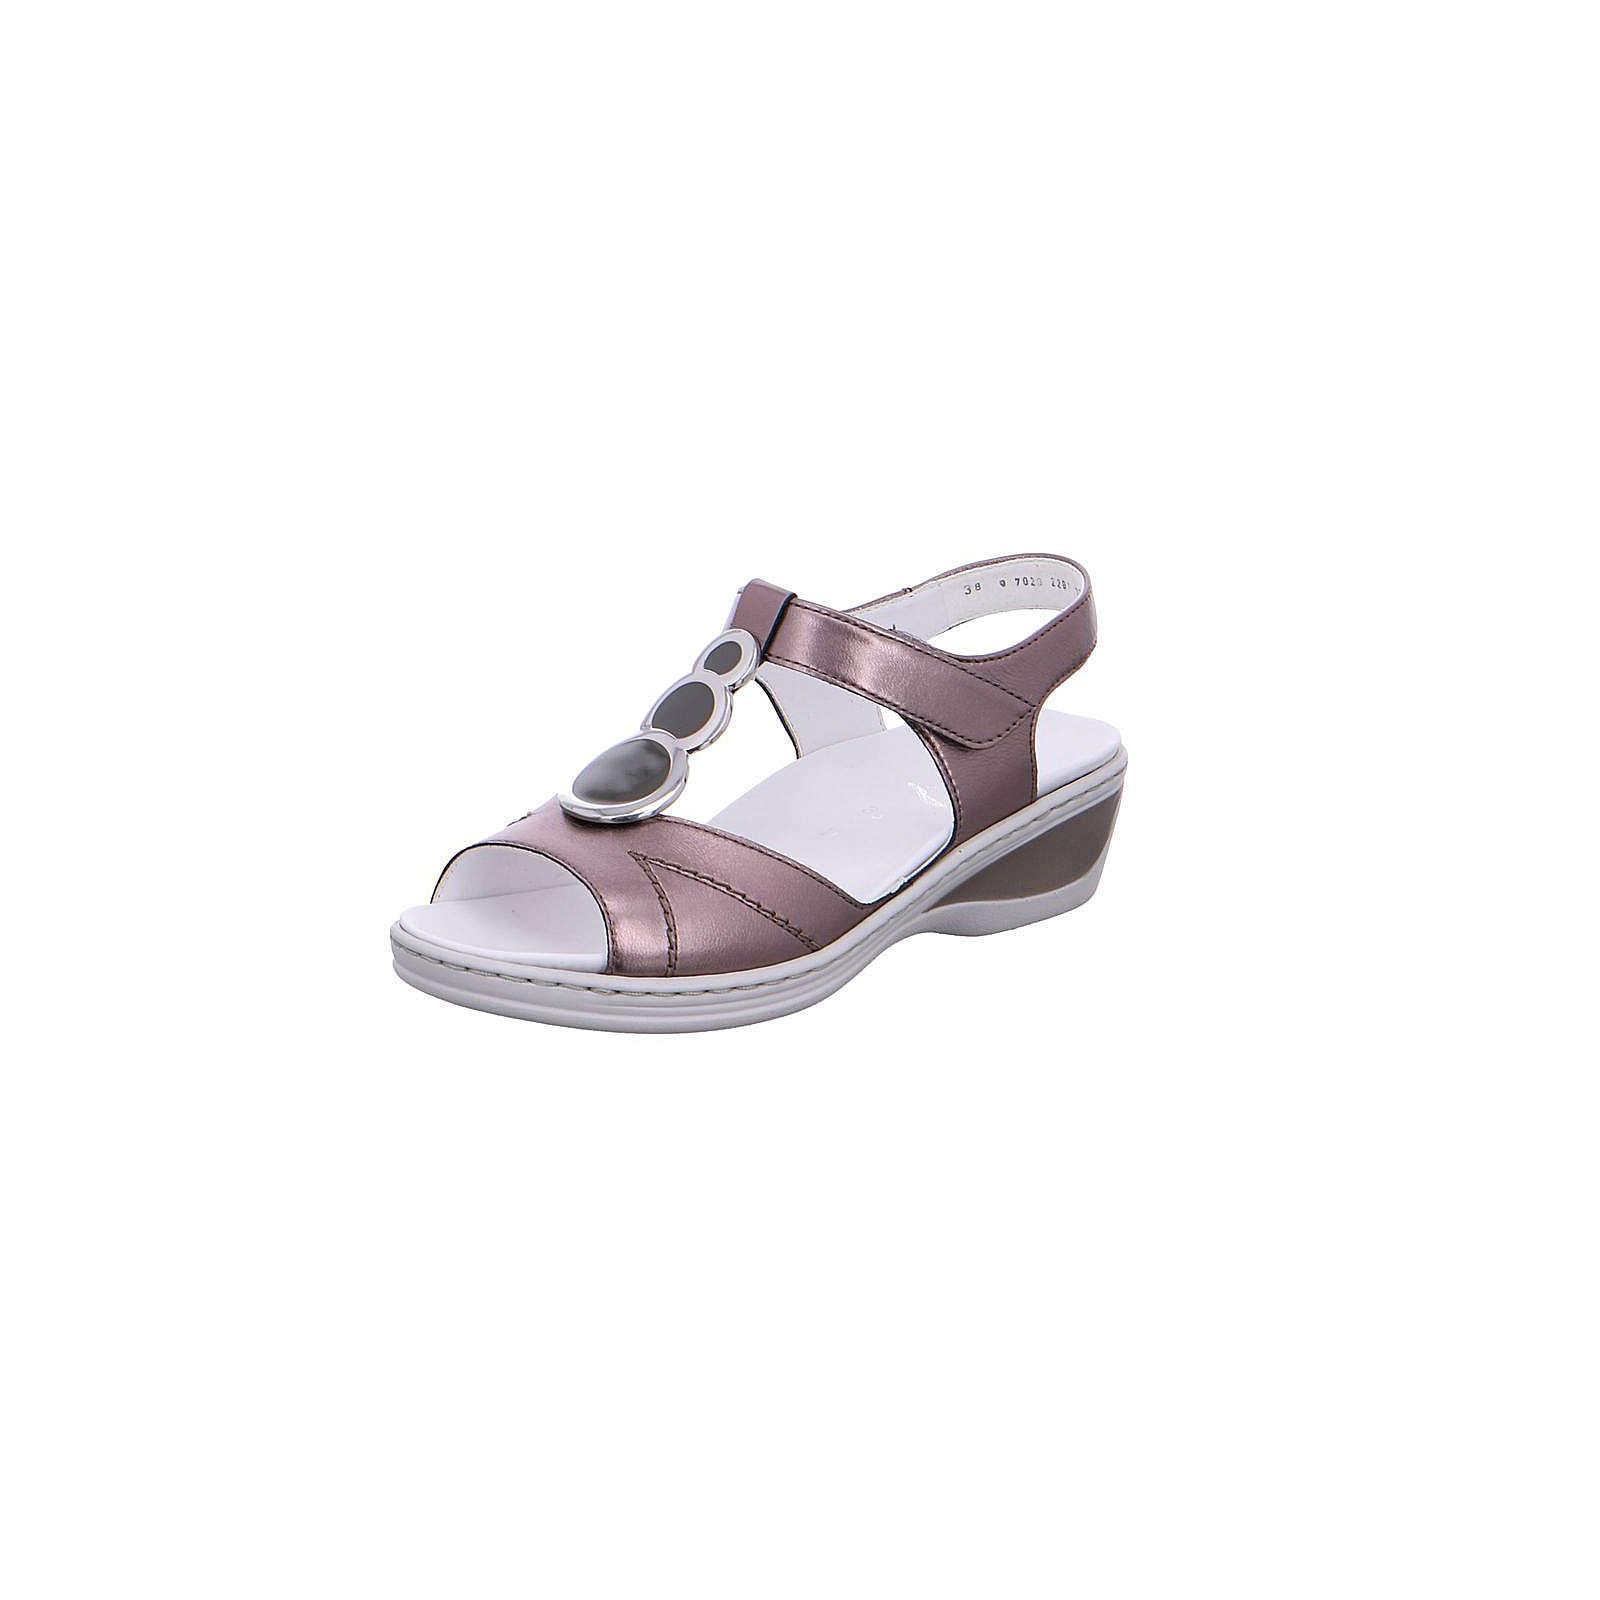 ara Klassische Sandaletten lila Damen Gr. 35